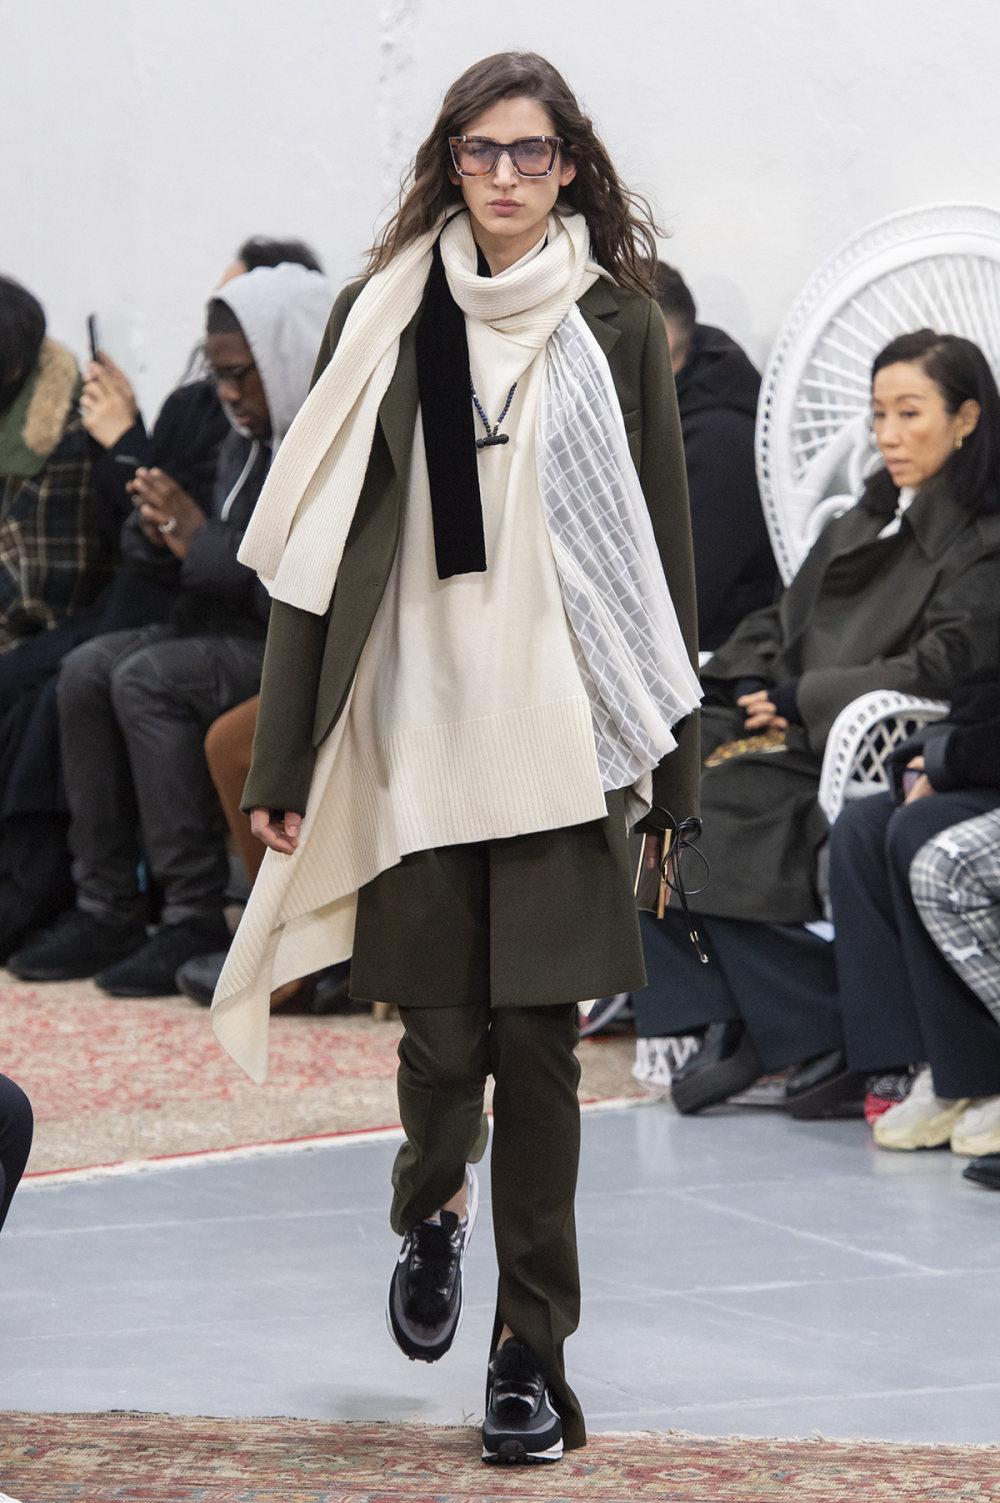 Sacai时装系列超大号黑色圆领毛衣和长款绿色北欧毛衣连衣裙-8.jpg